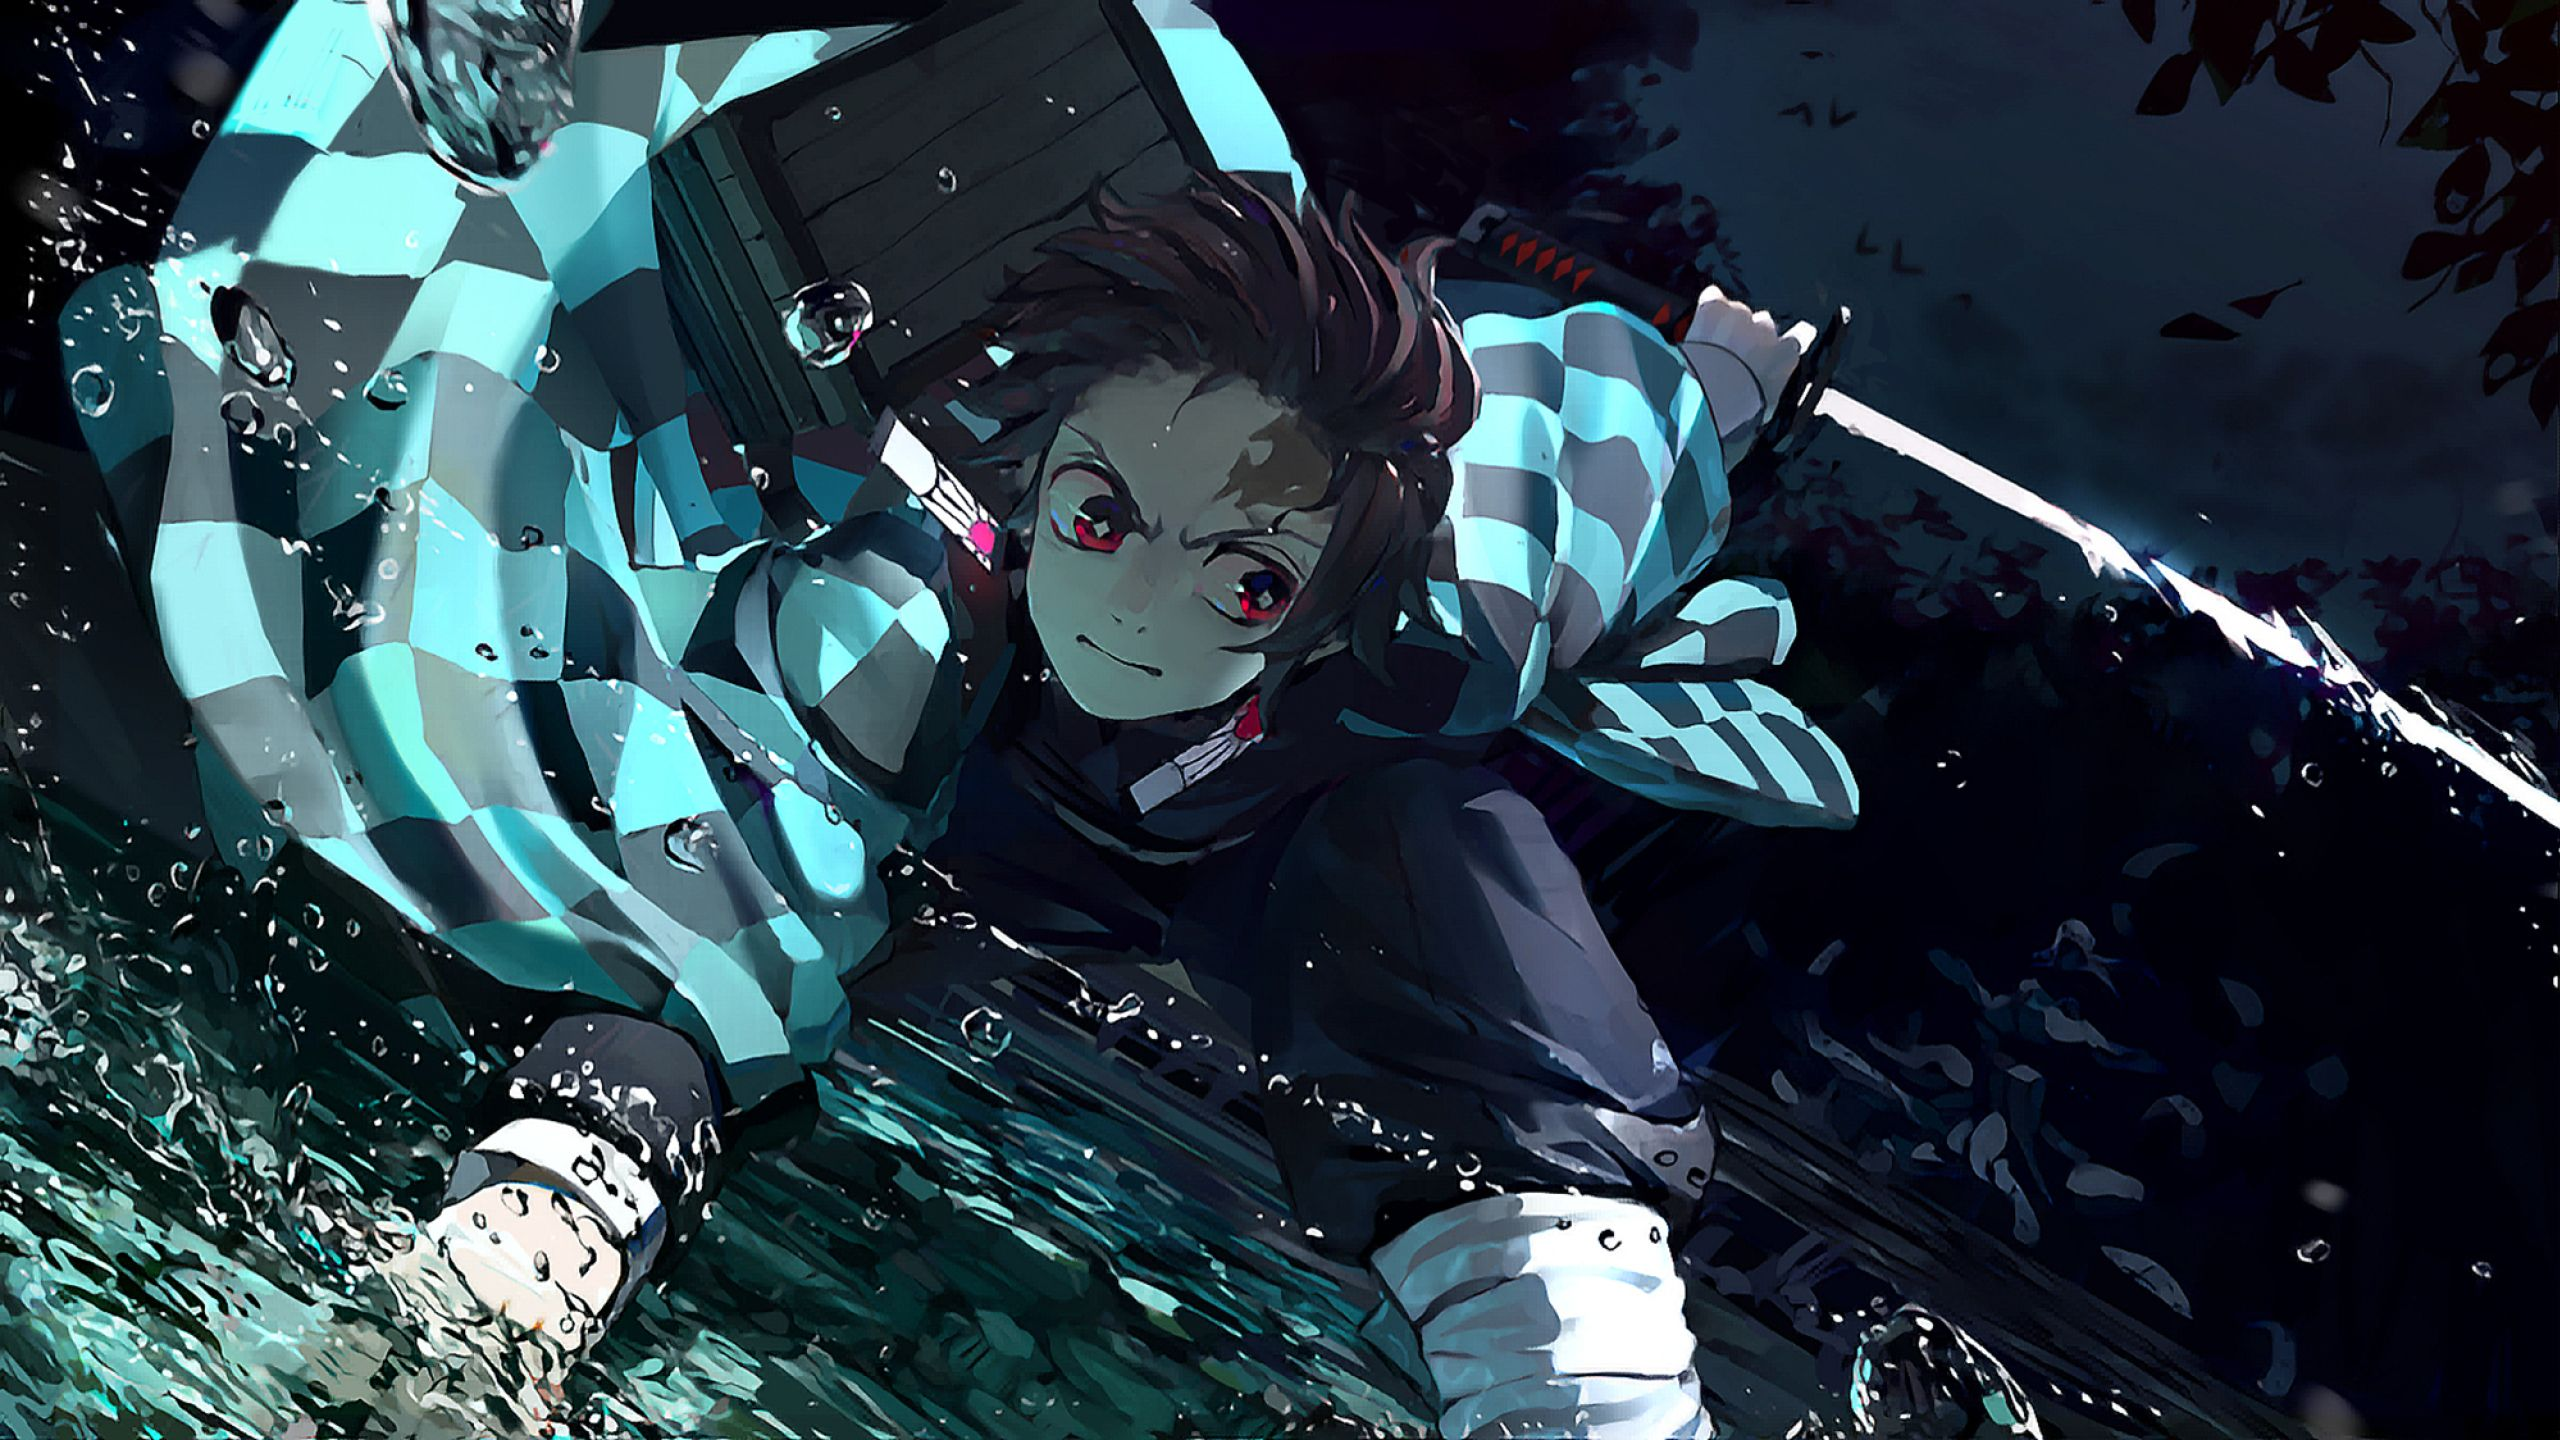 demon slayer hd background